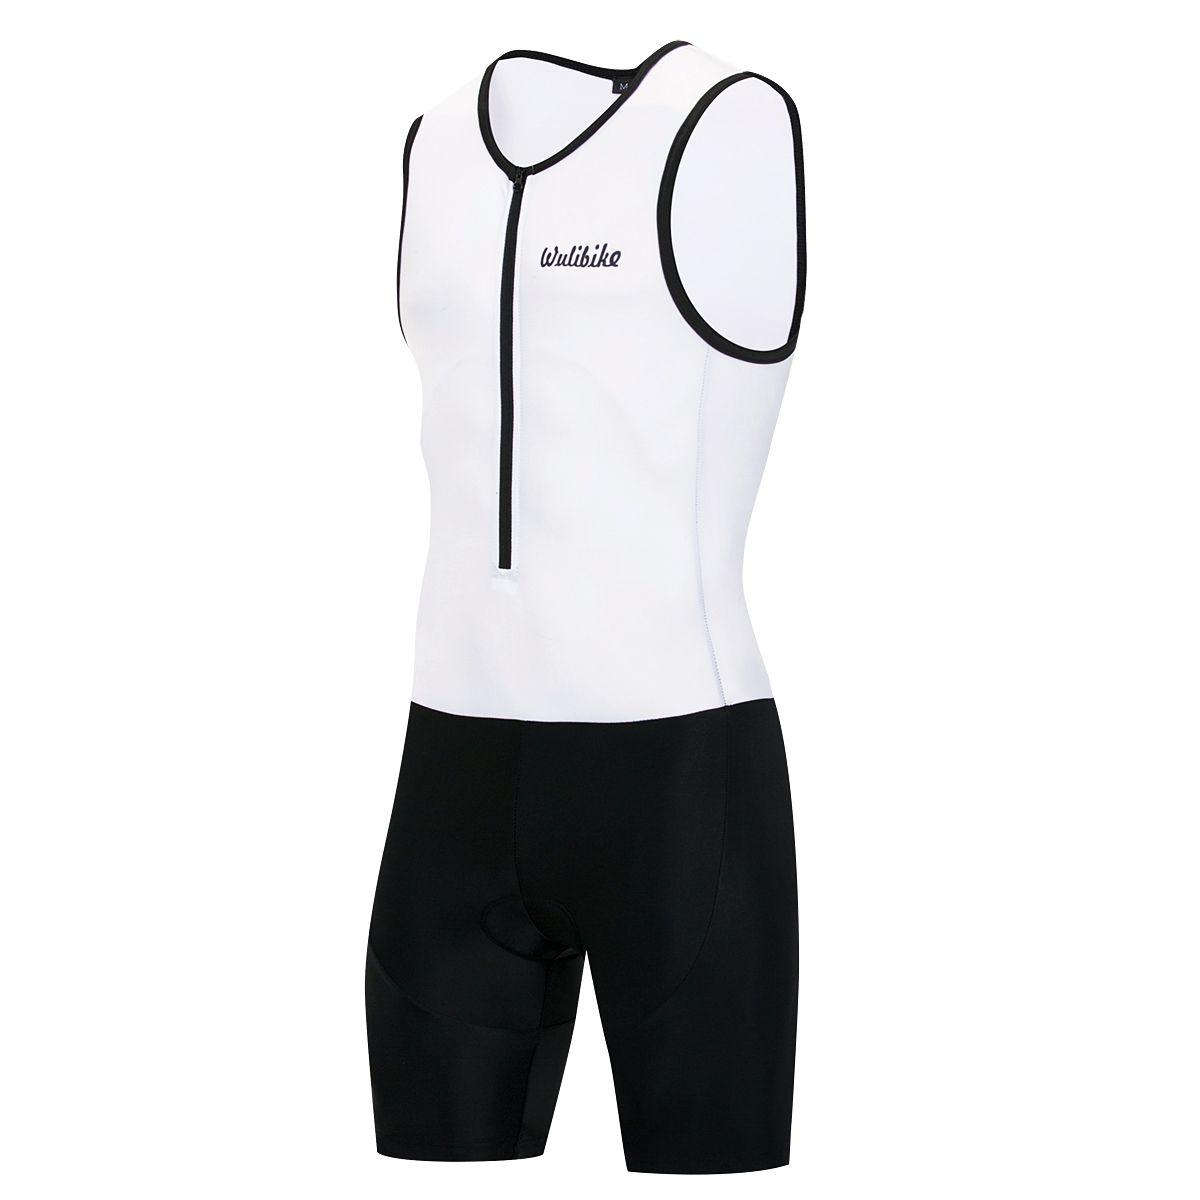 Men's Sleeveless Triathlon Trisuit Quick Dry Skinsuit Breathable Triathlon Racing Suit